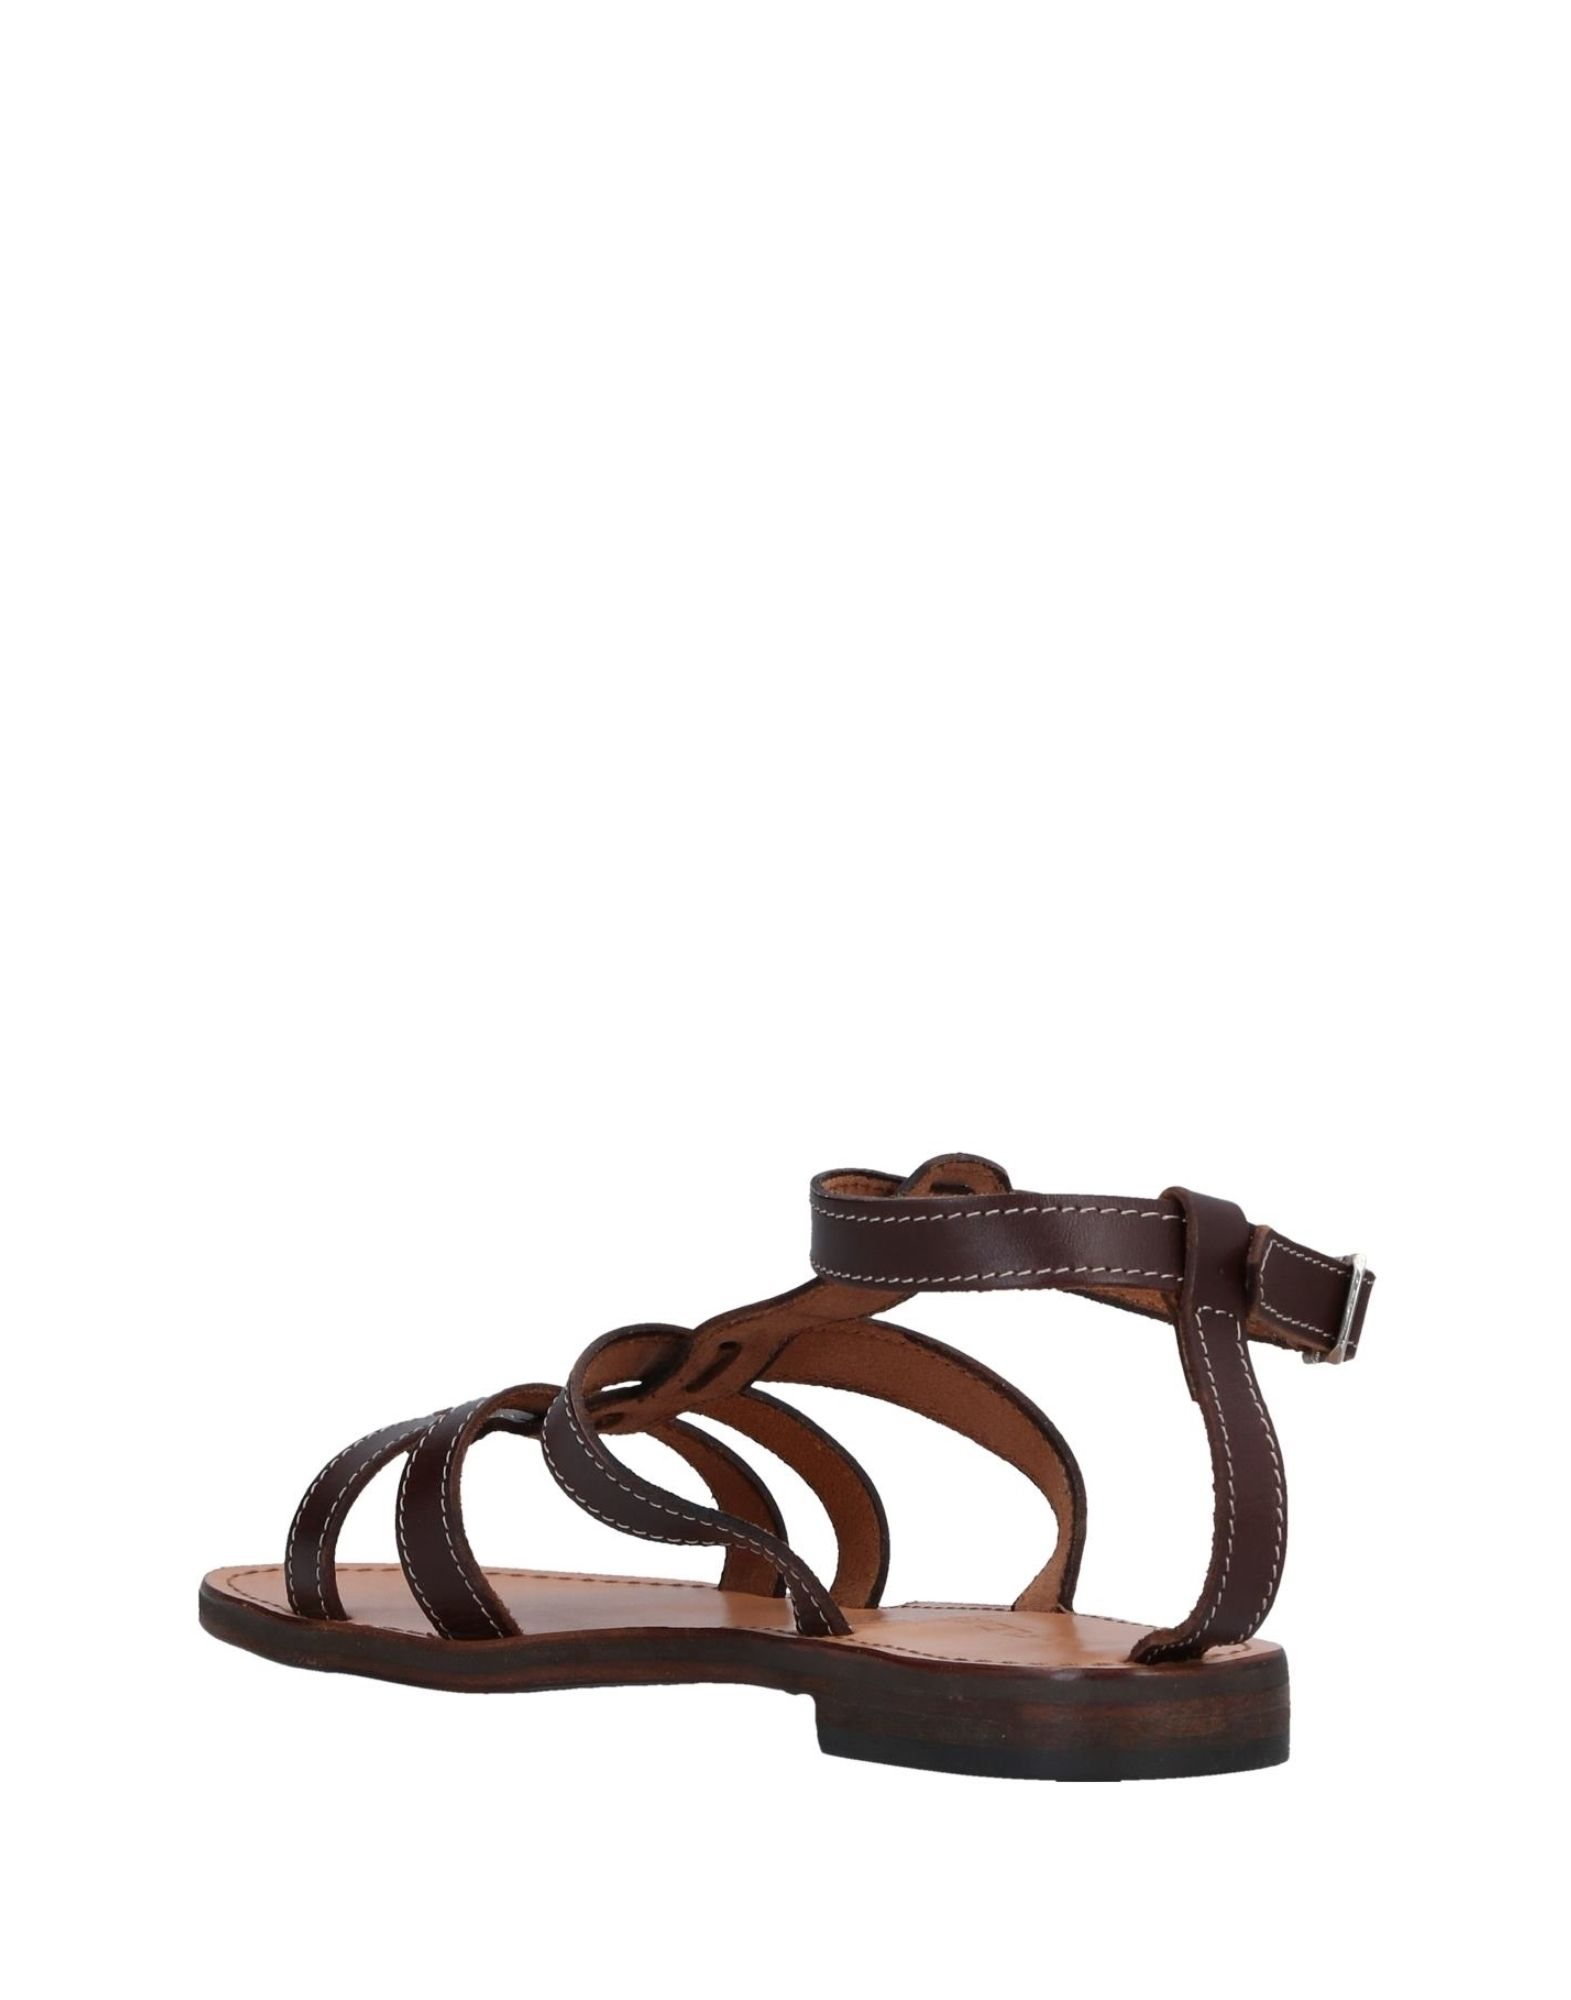 Haltbare Mode Sandalen billige Schuhe Florence Sandalen Mode Damen  11527154BM Heiße Schuhe e8581c